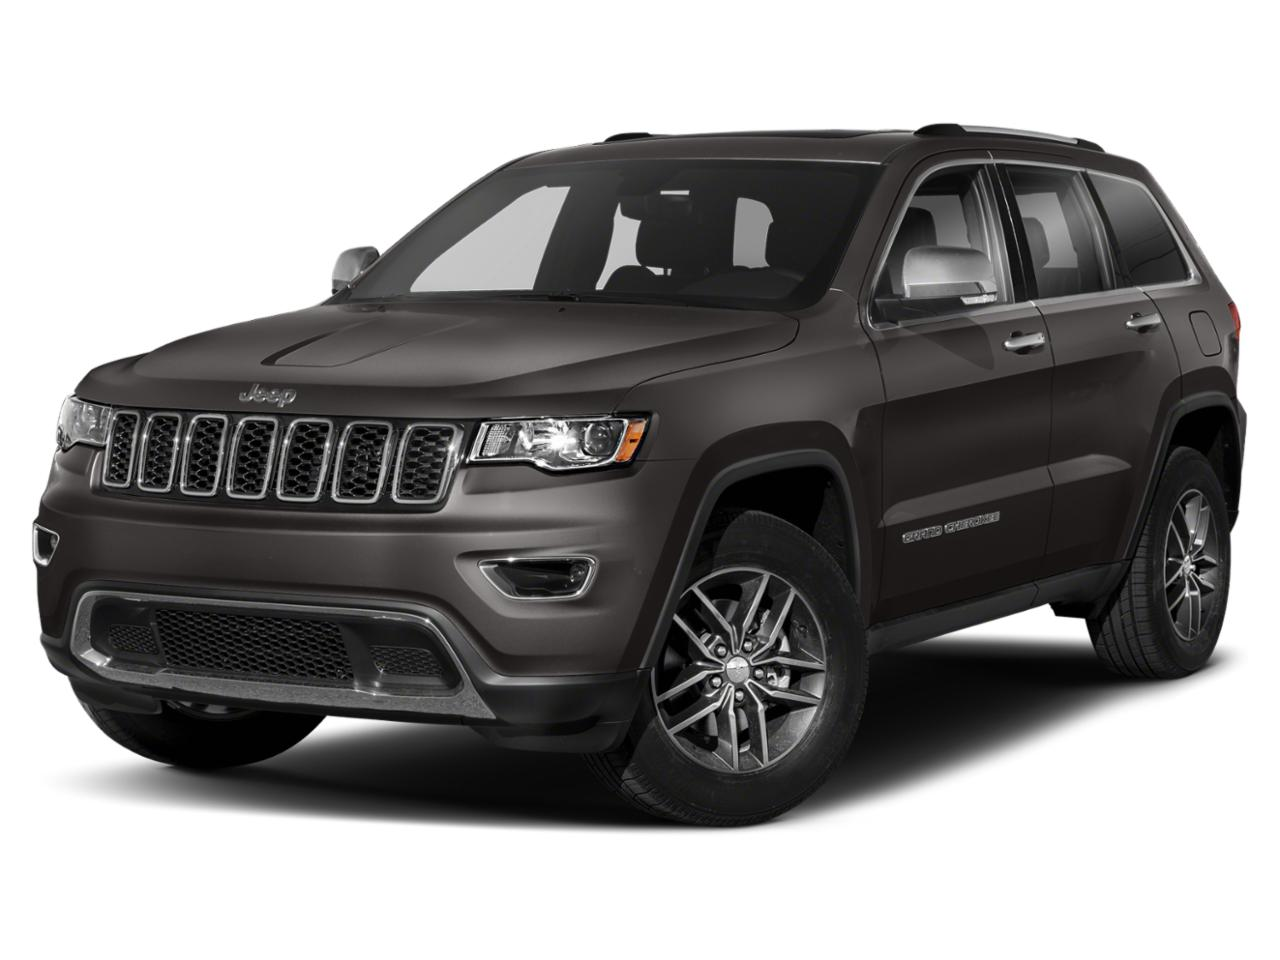 2021 Jeep Grand Cherokee Vehicle Photo in Colma, CA 94014